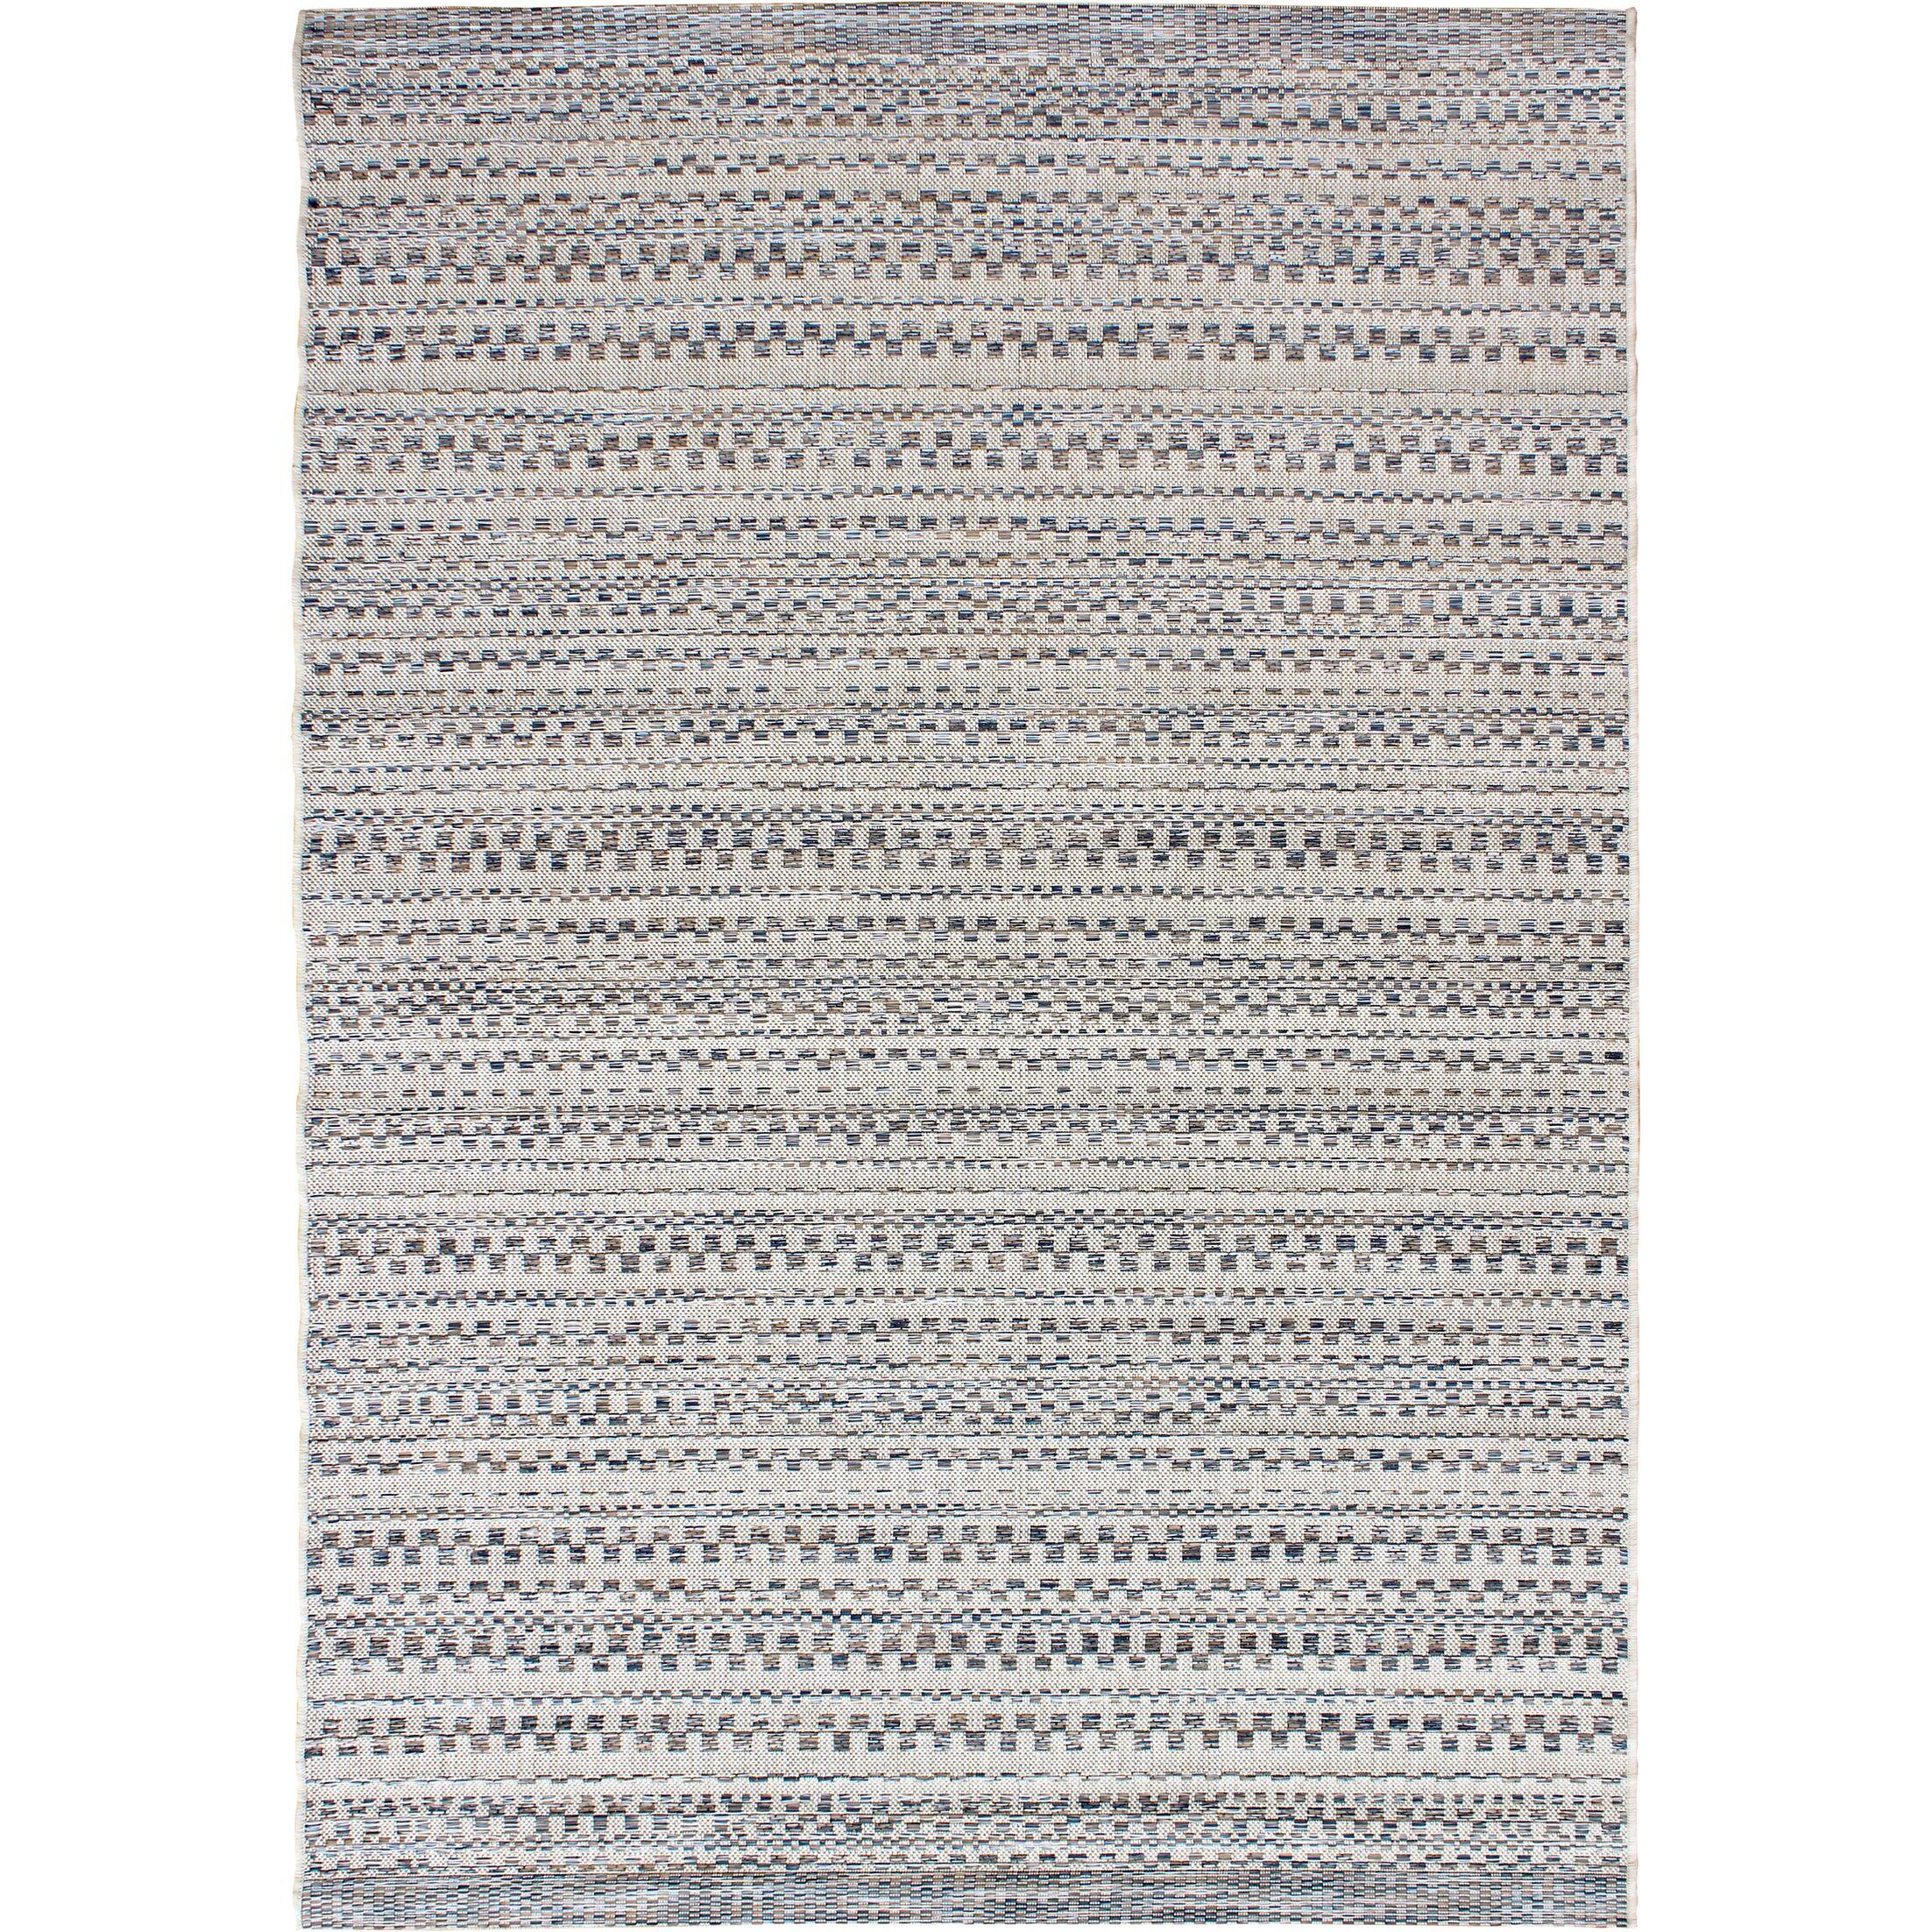 Papillion Dark Blue/Ivory Indoor/Outdoor Area Rug Rug Size: 7'7